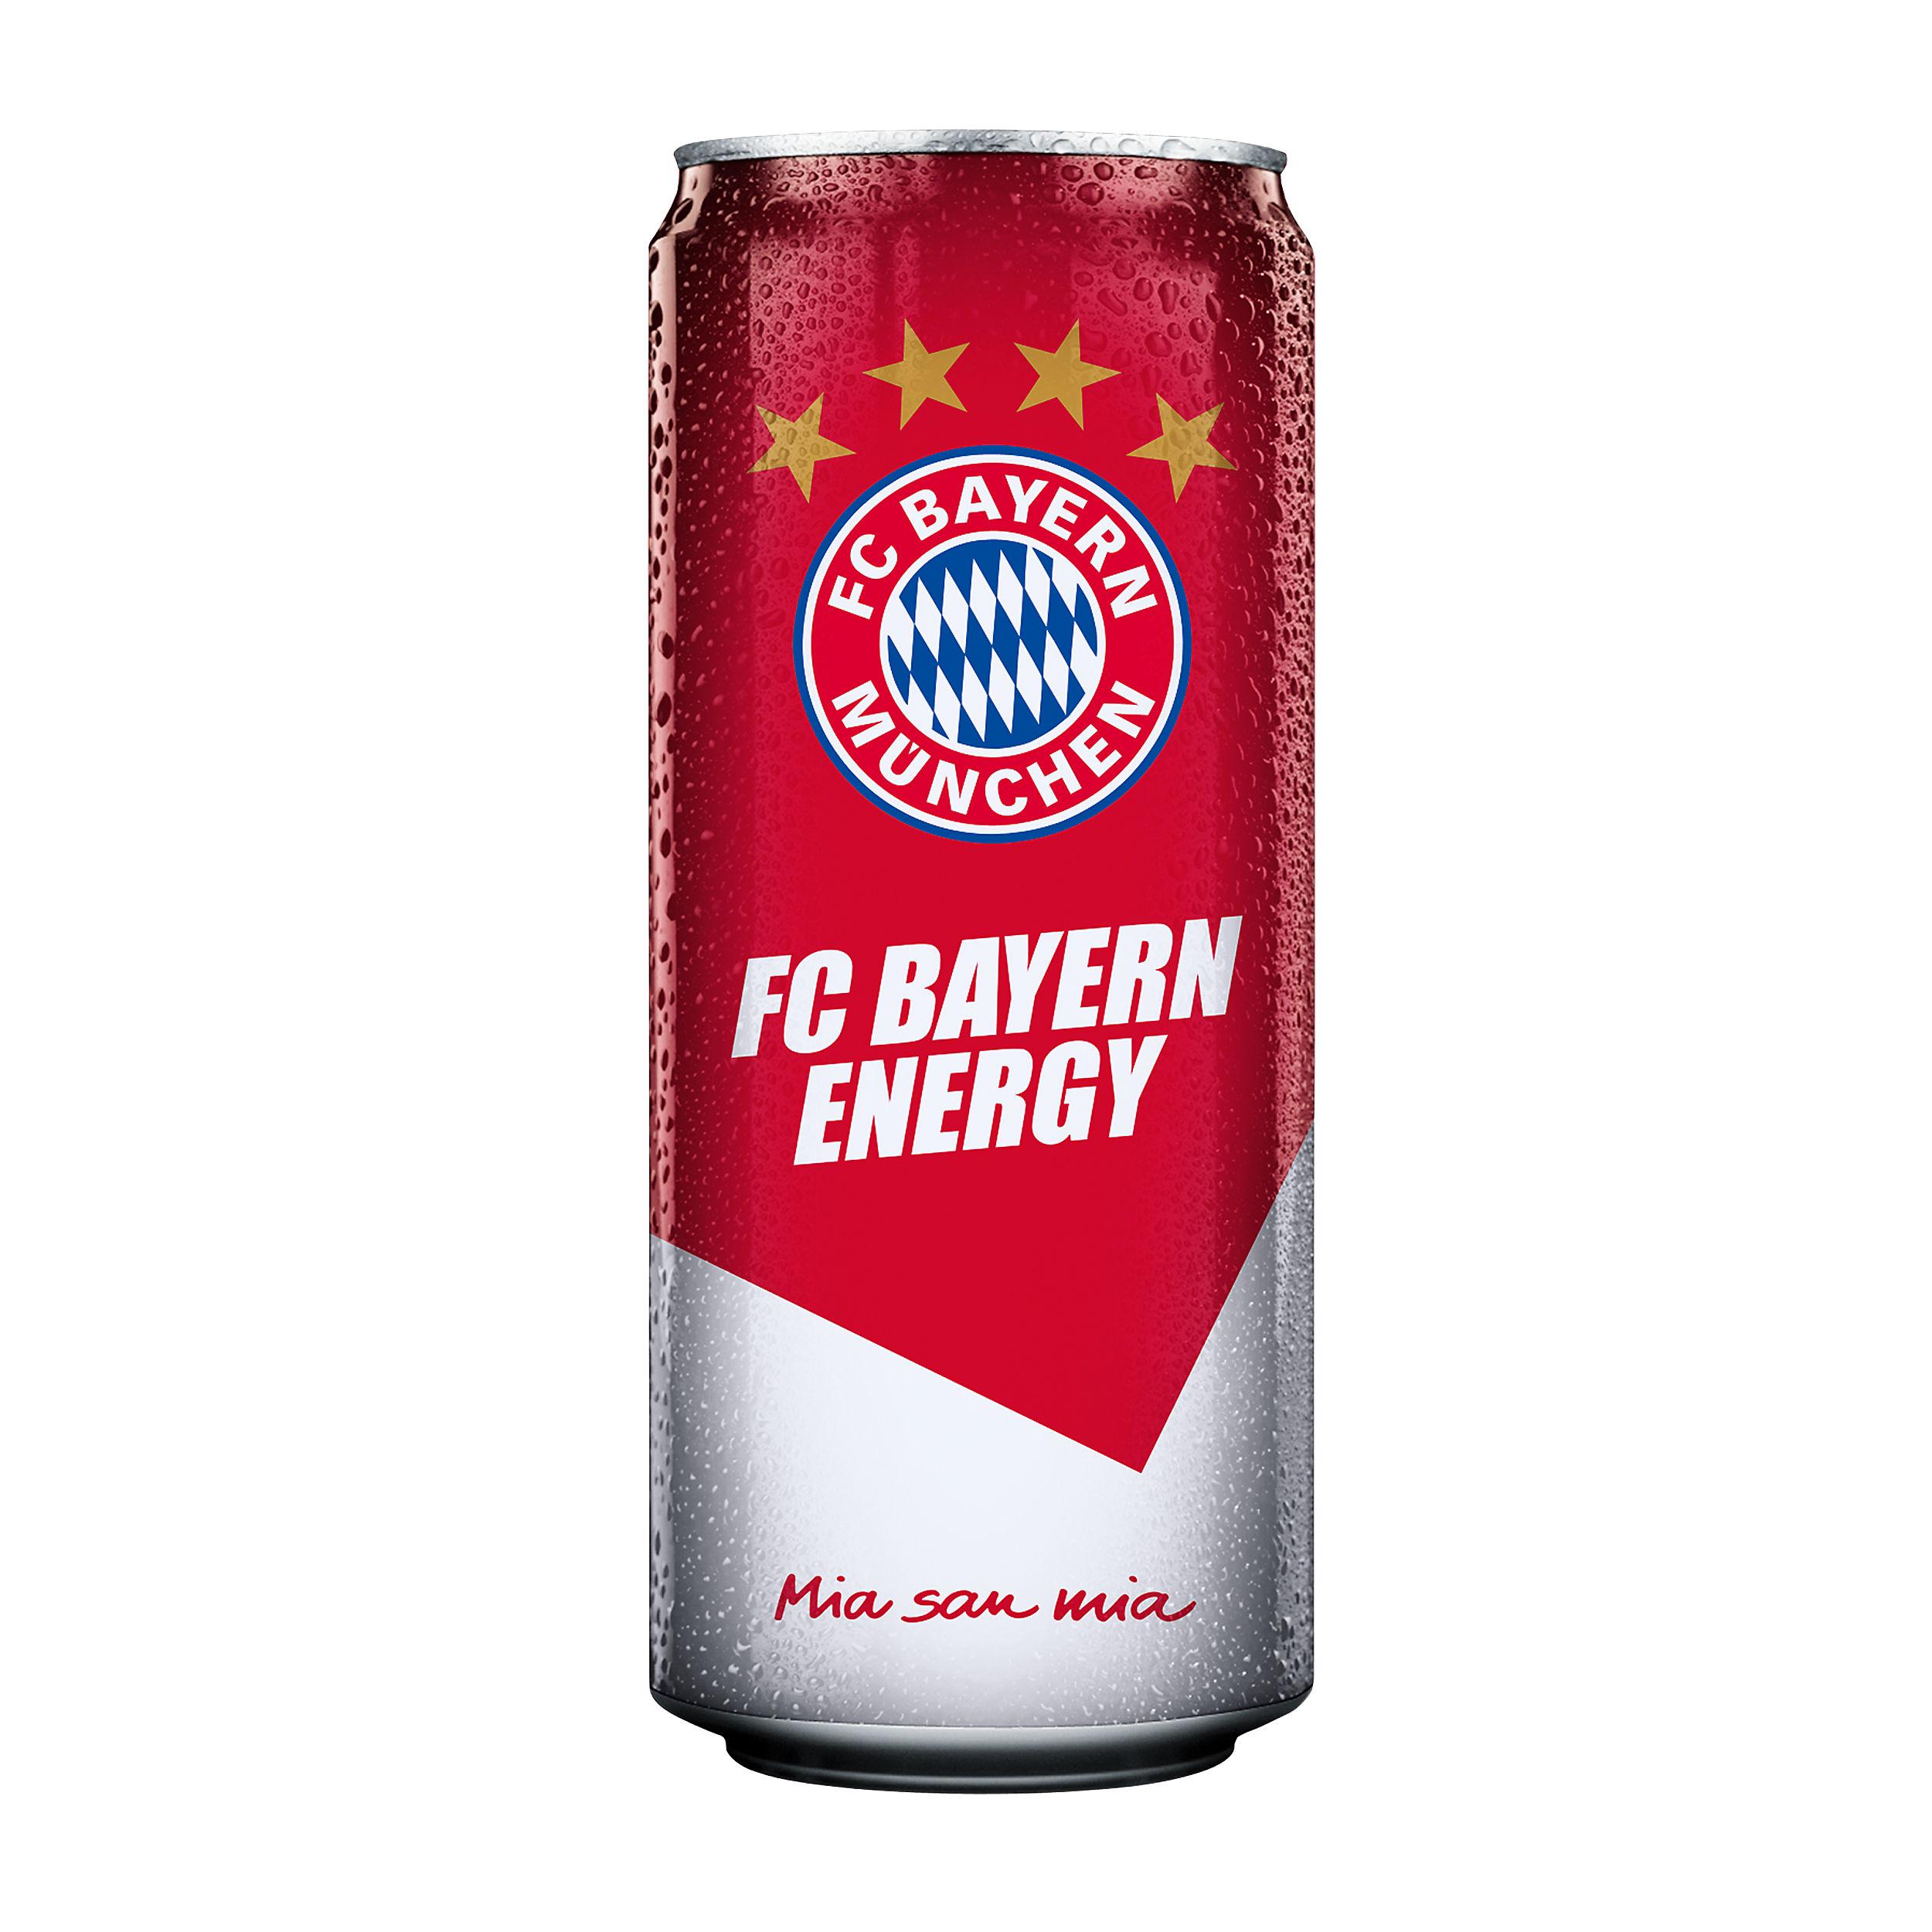 FC Bayern Energy Drink | Offizieller FC Bayern Fanshop